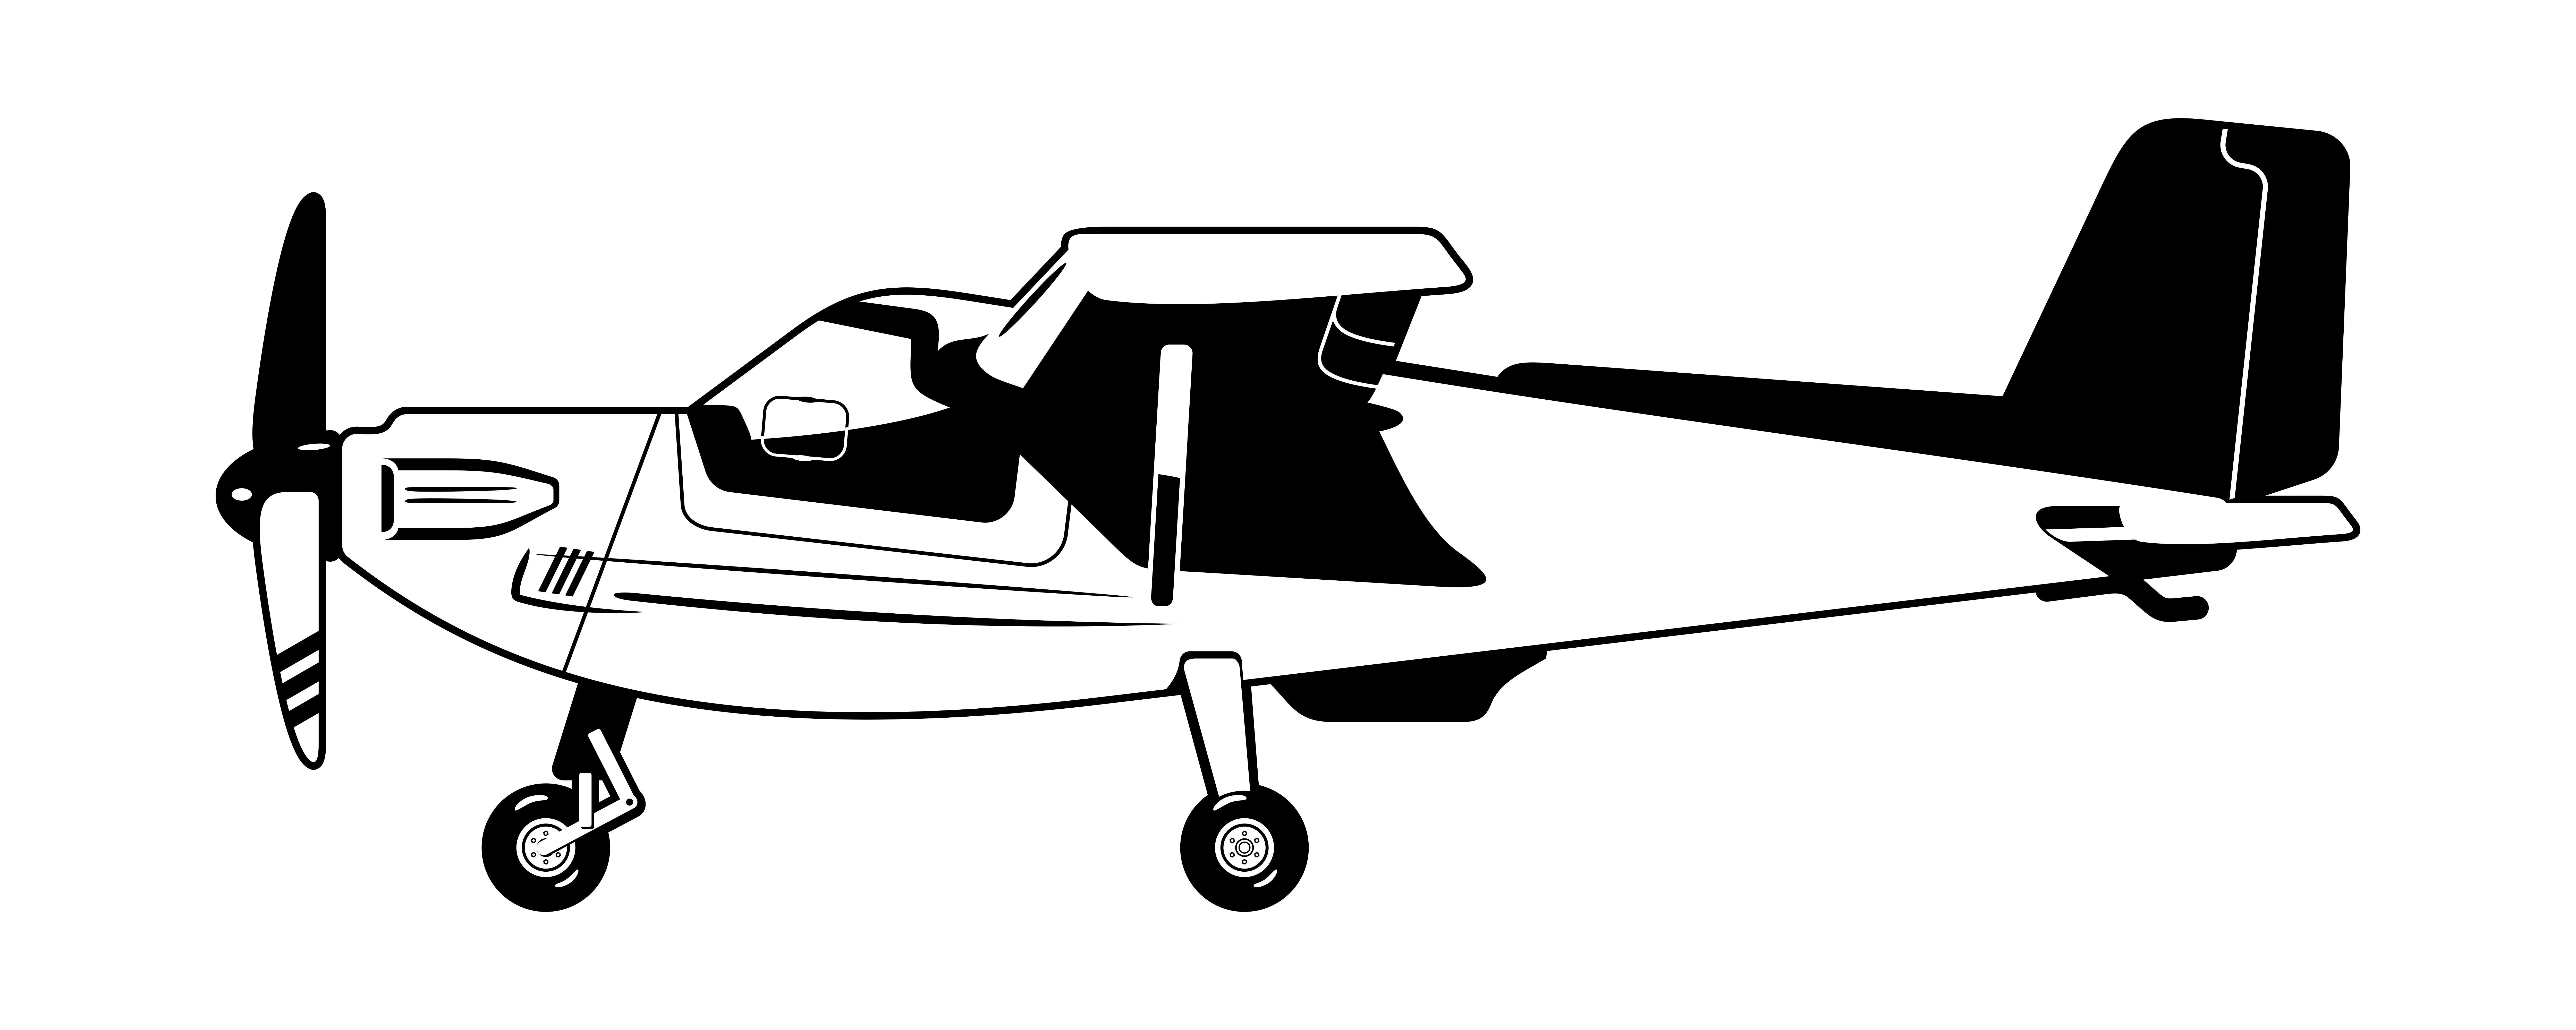 Airplane 4000